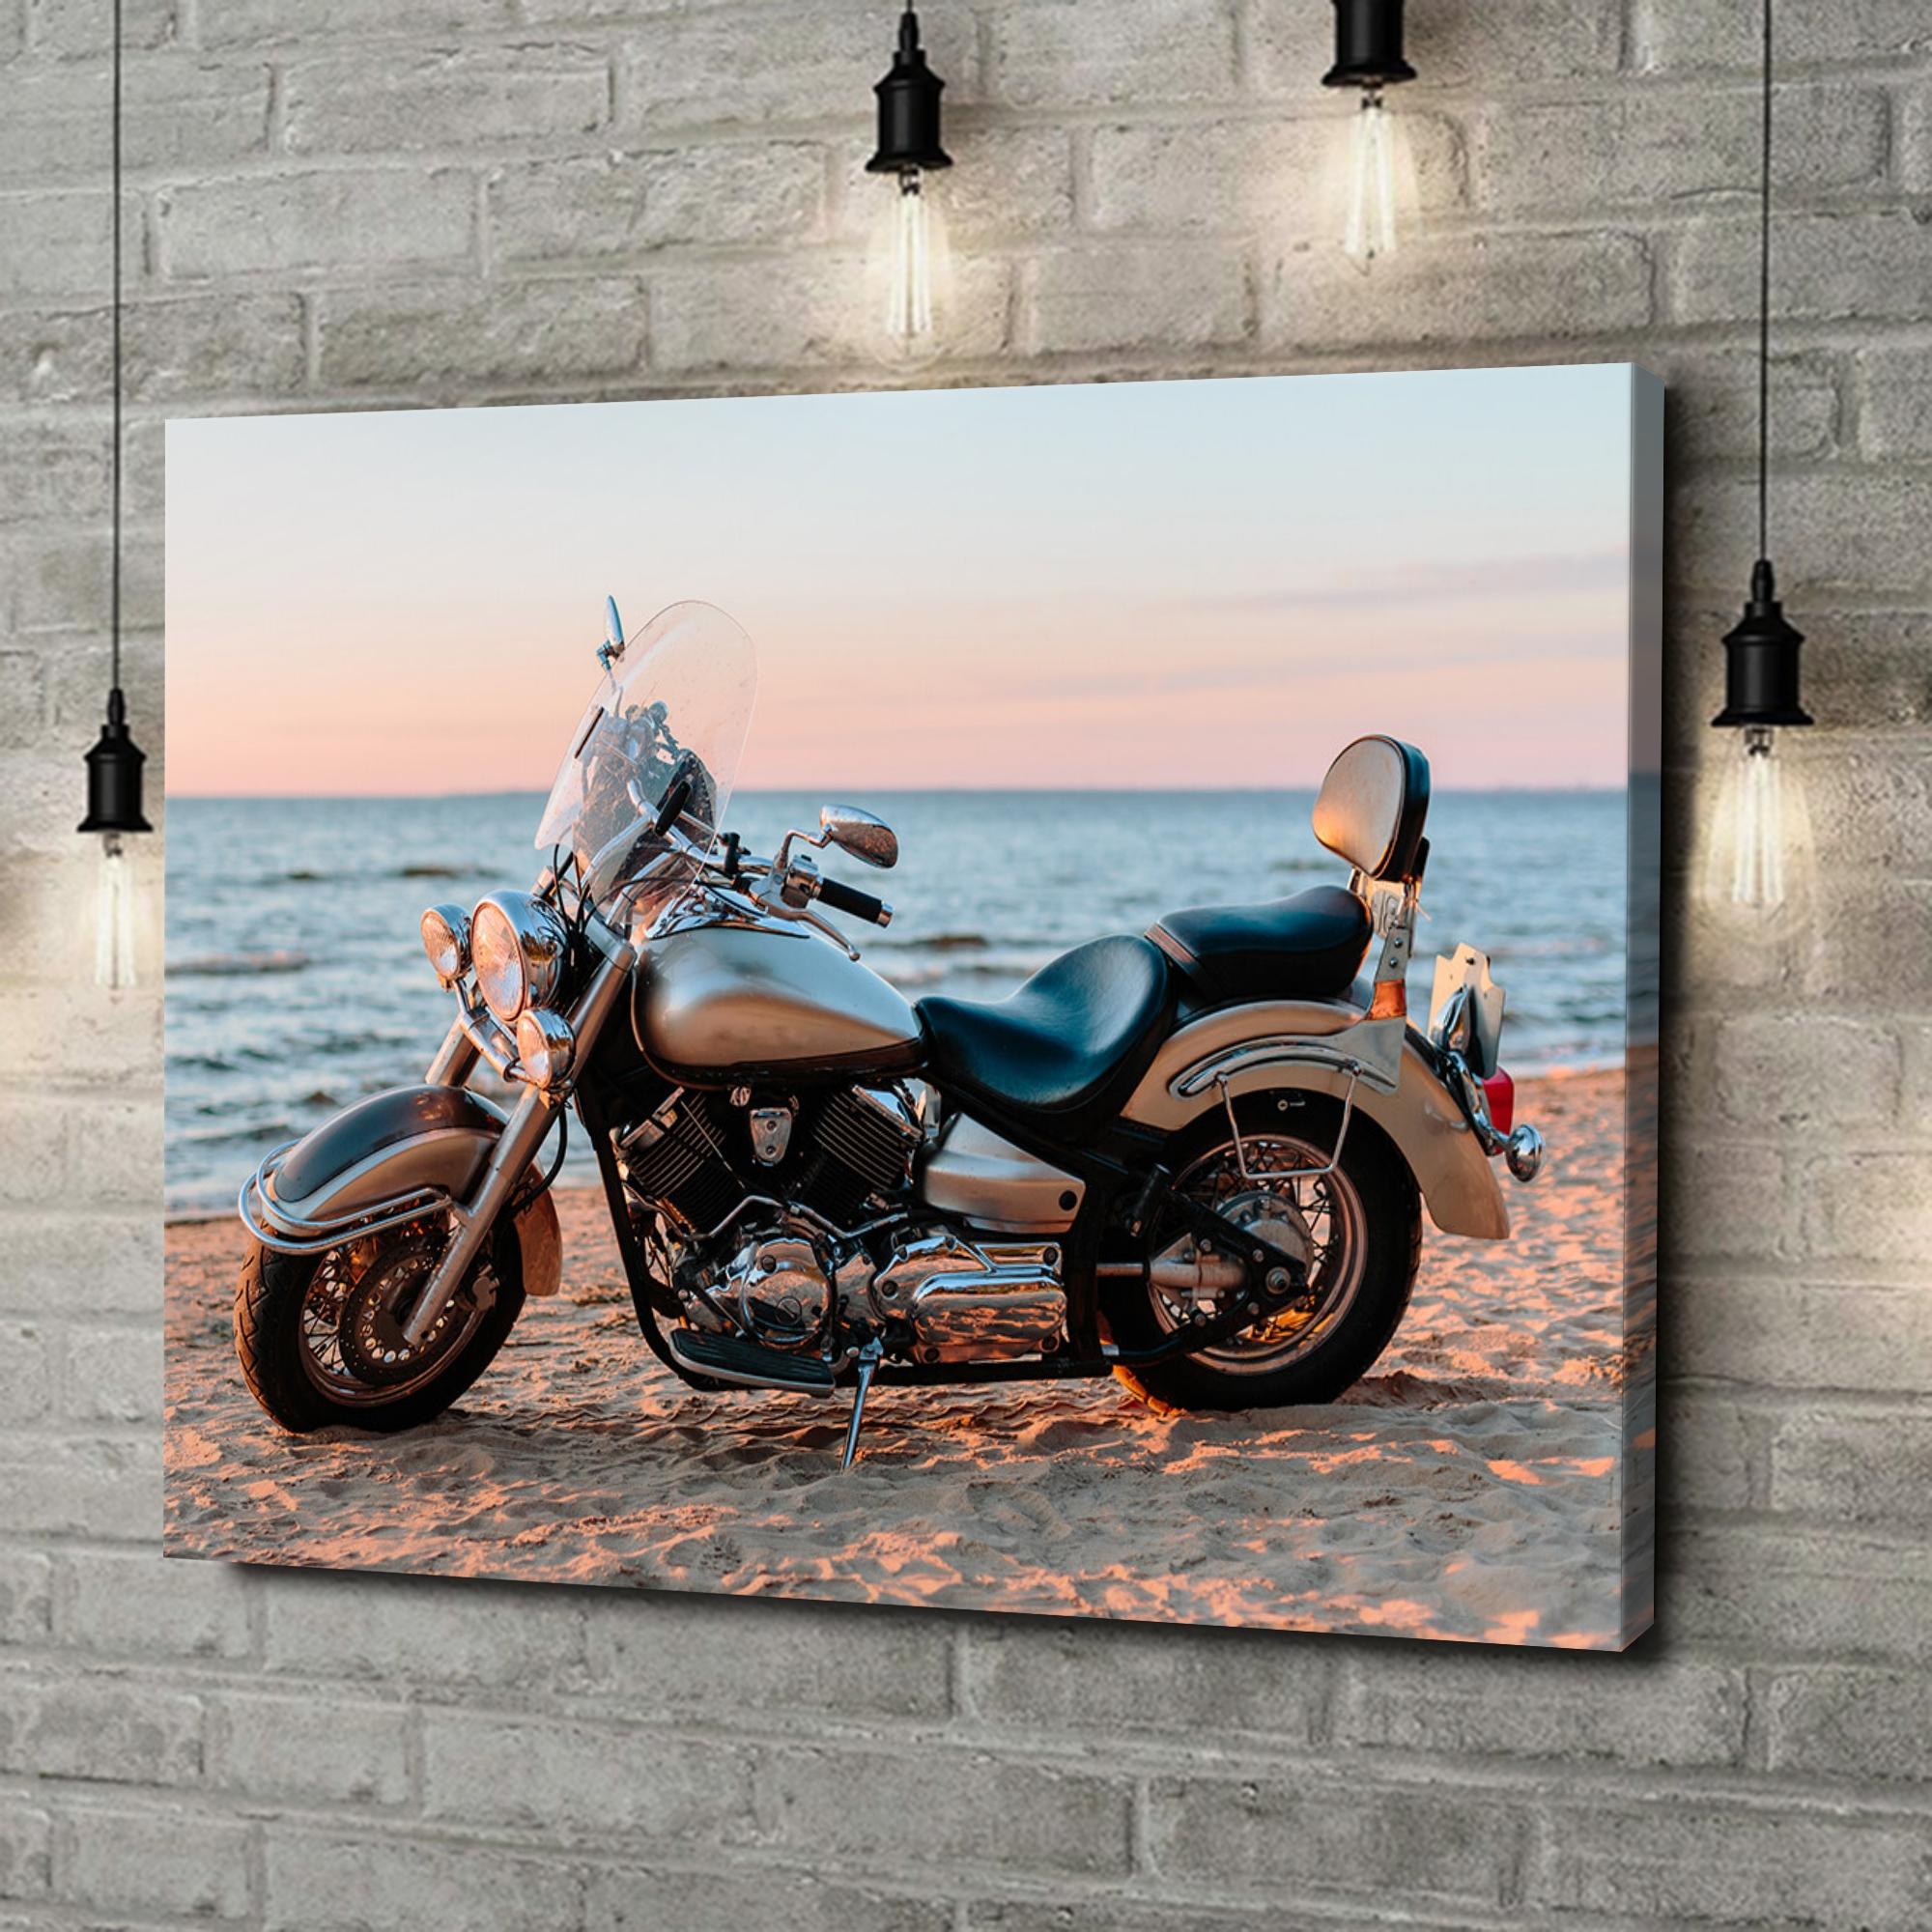 Leinwandbild personalisiert Motorrad am Strand